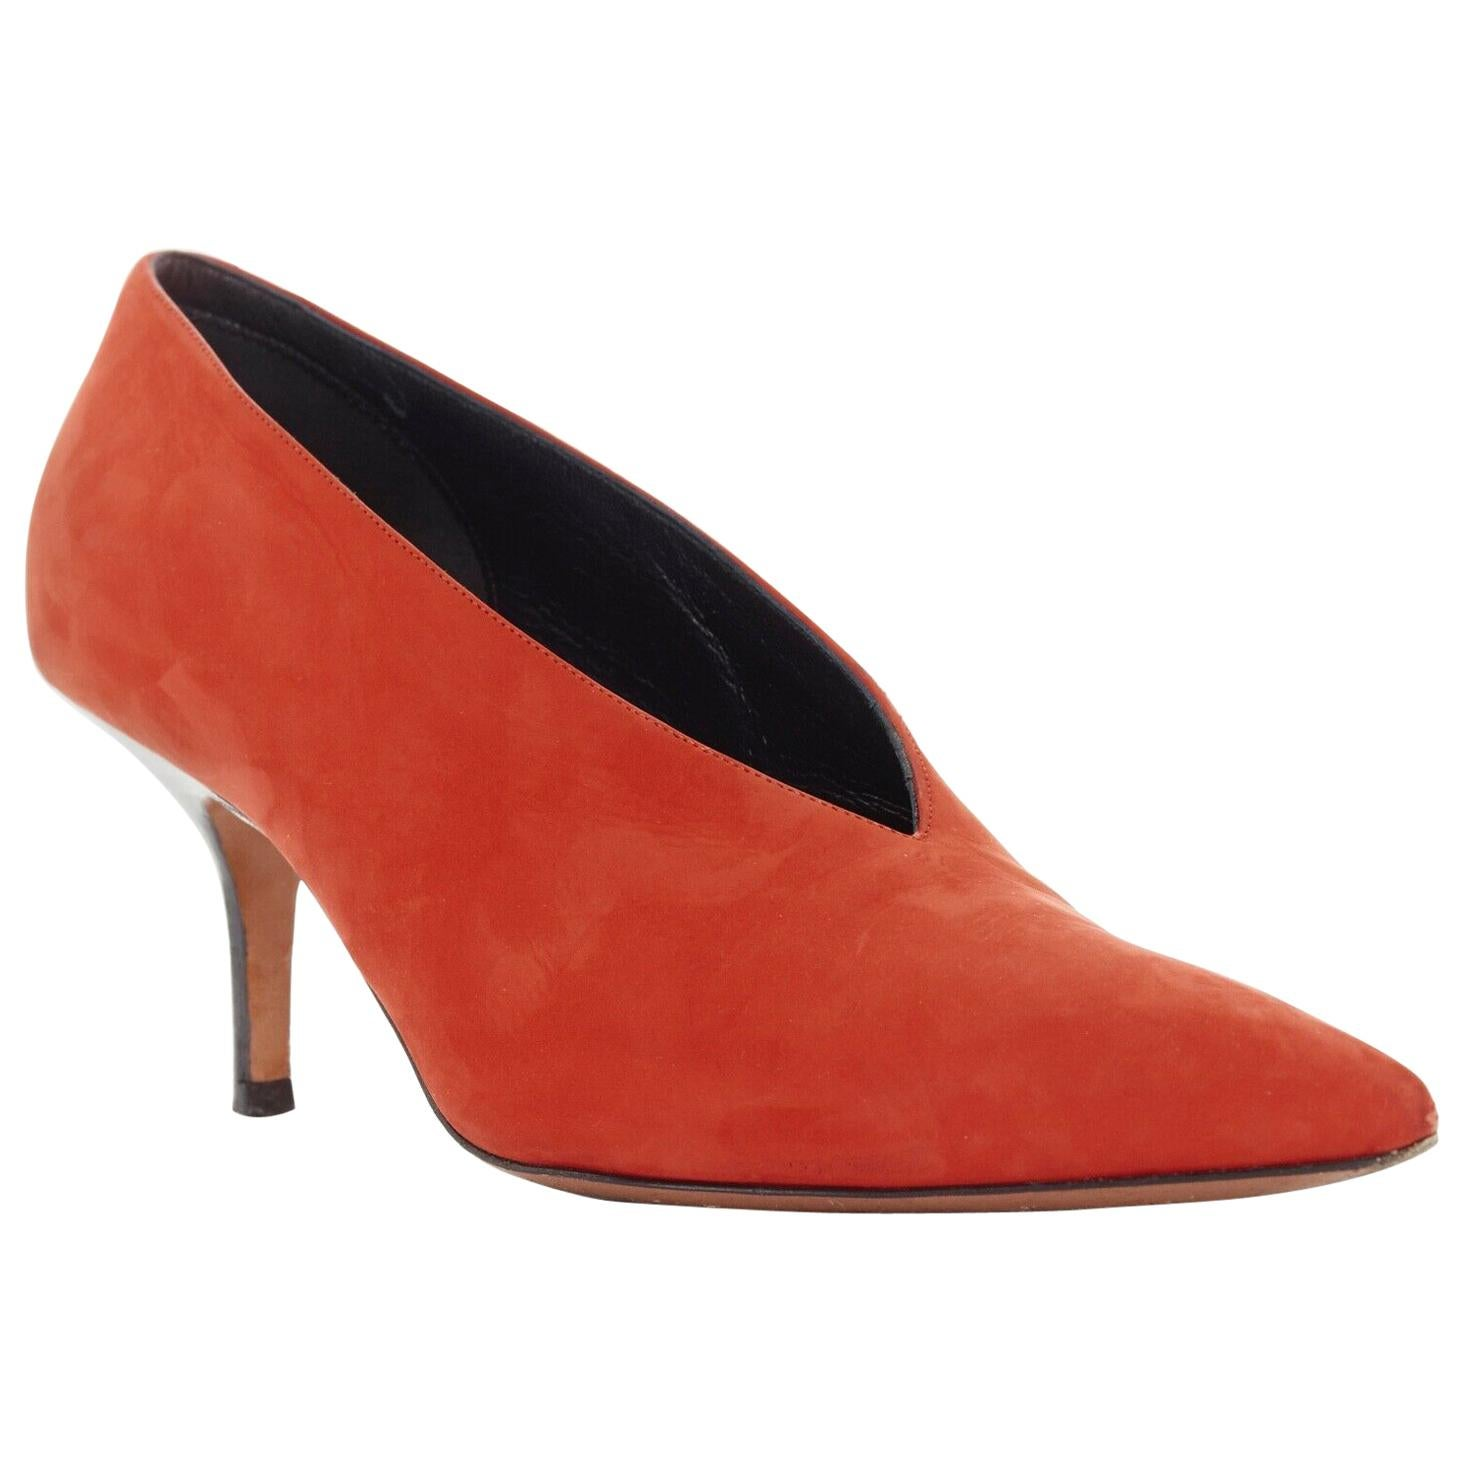 CELINE PHILO red suede V-neck pointed toe black slim heel pumps EU38